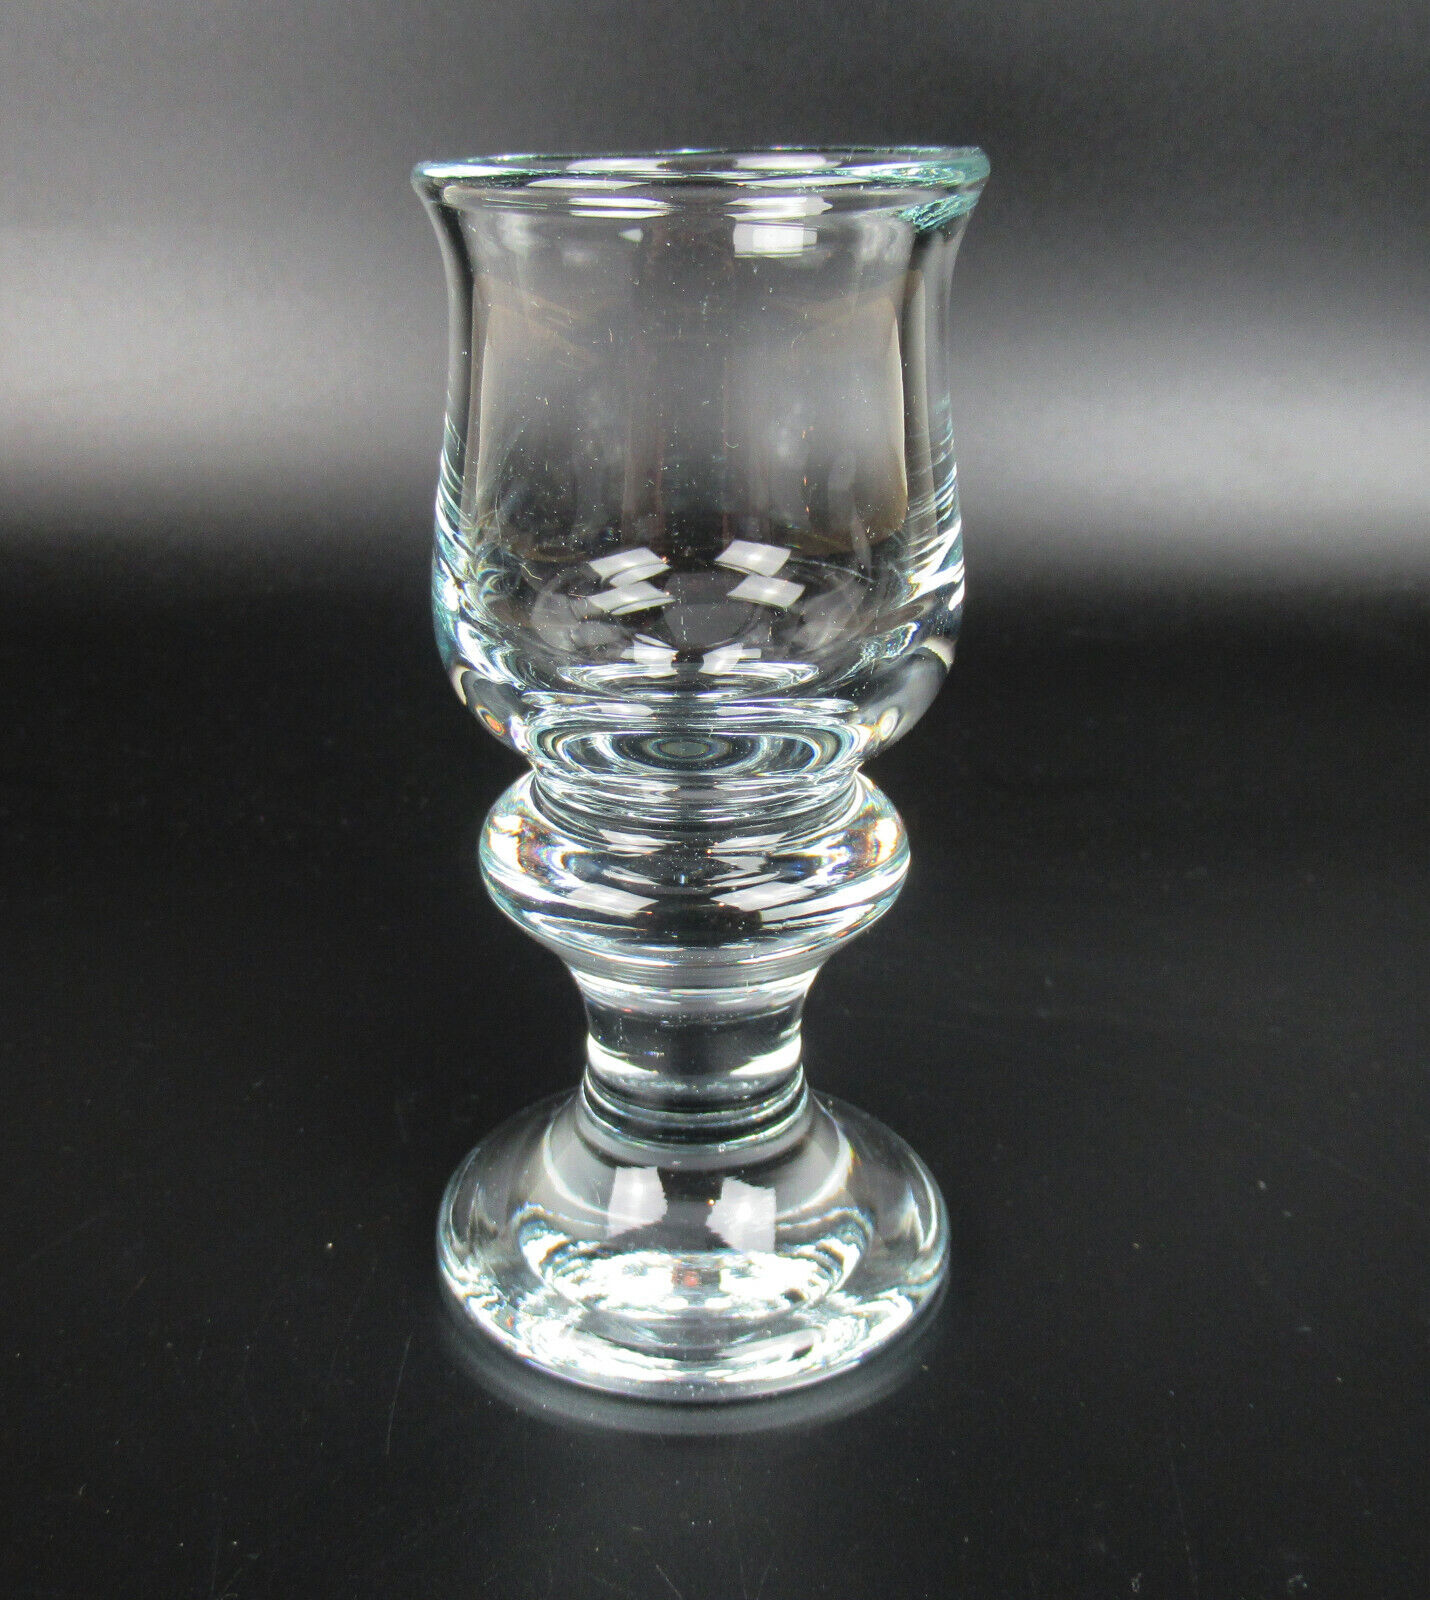 Holmegaard Schnapsglas Serie Tivoli Per Lütken Design 1968 Denmark Shot Glass